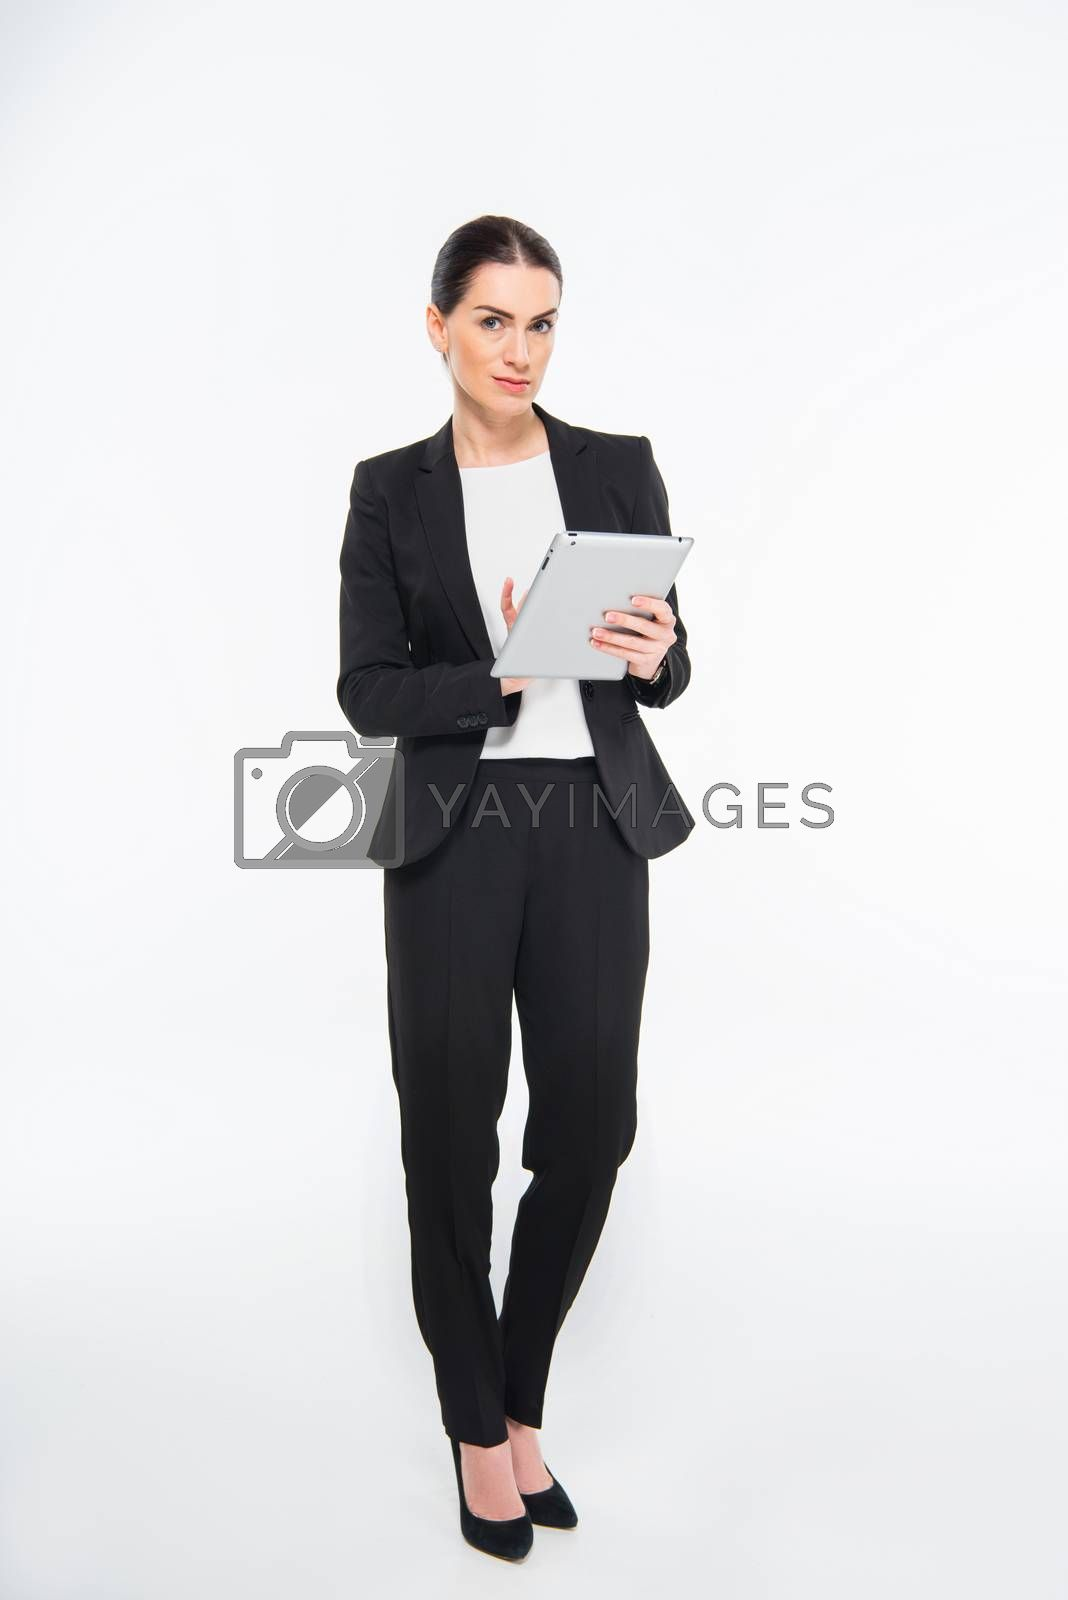 Businesswoman using digital tablet by LightFieldStudios